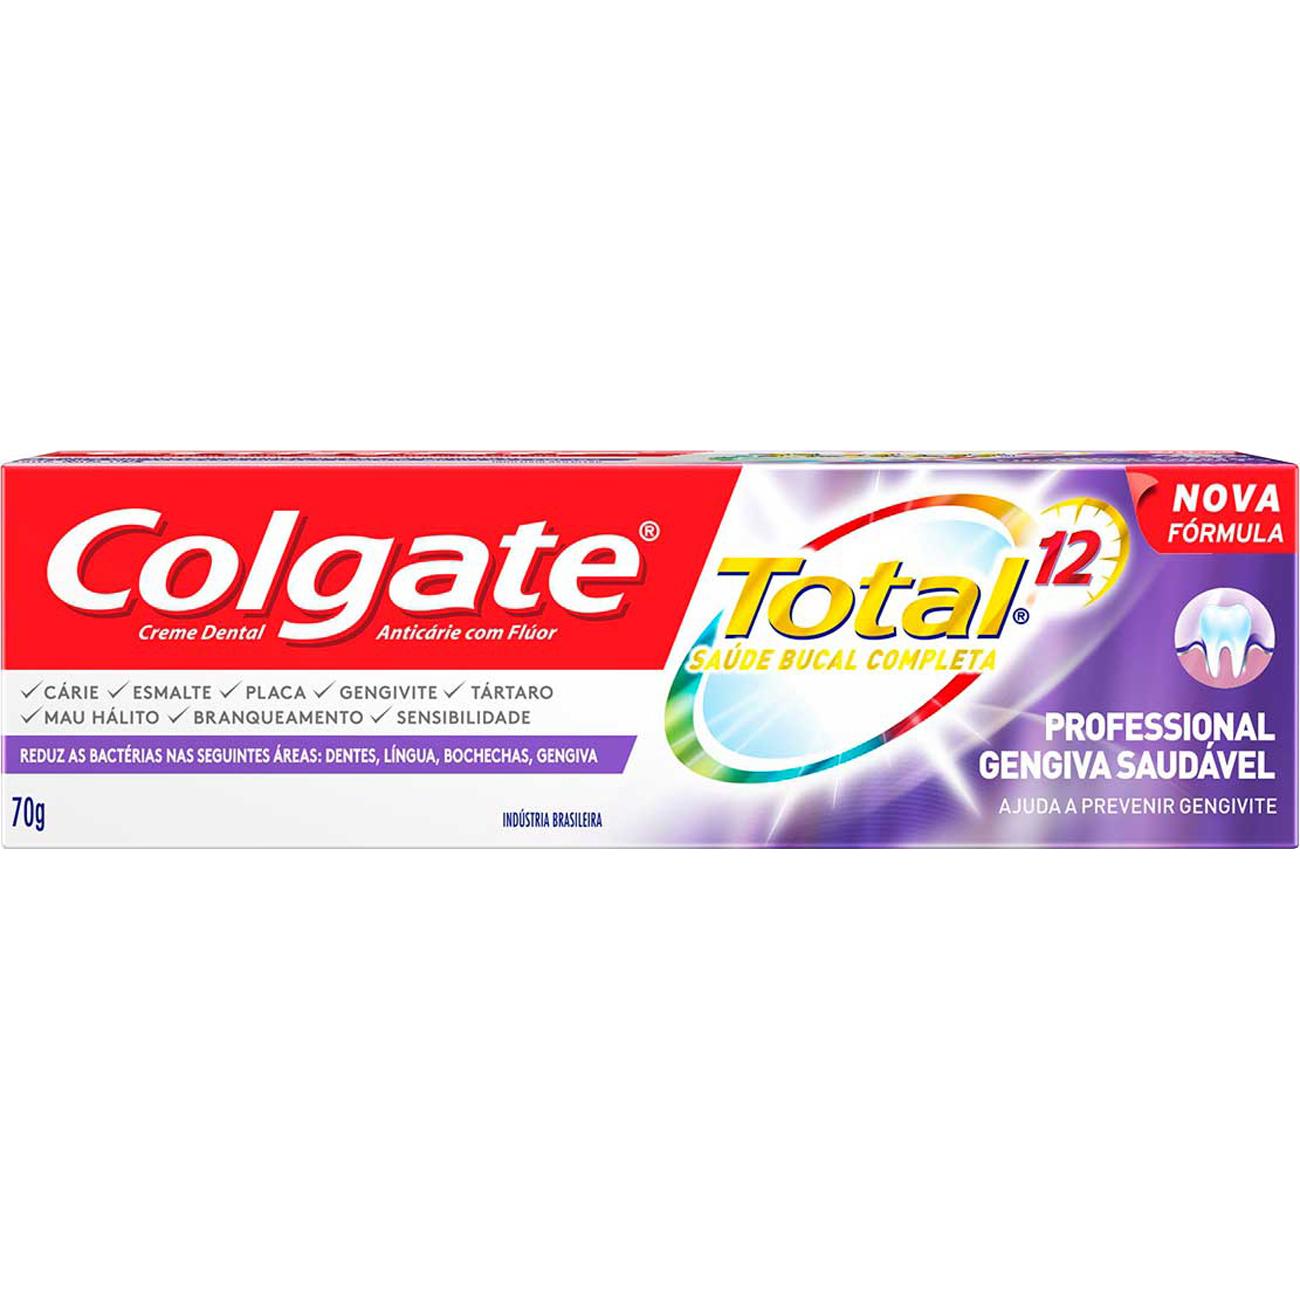 Creme Dental Colgate Total 12 Professional Gengiva Saud